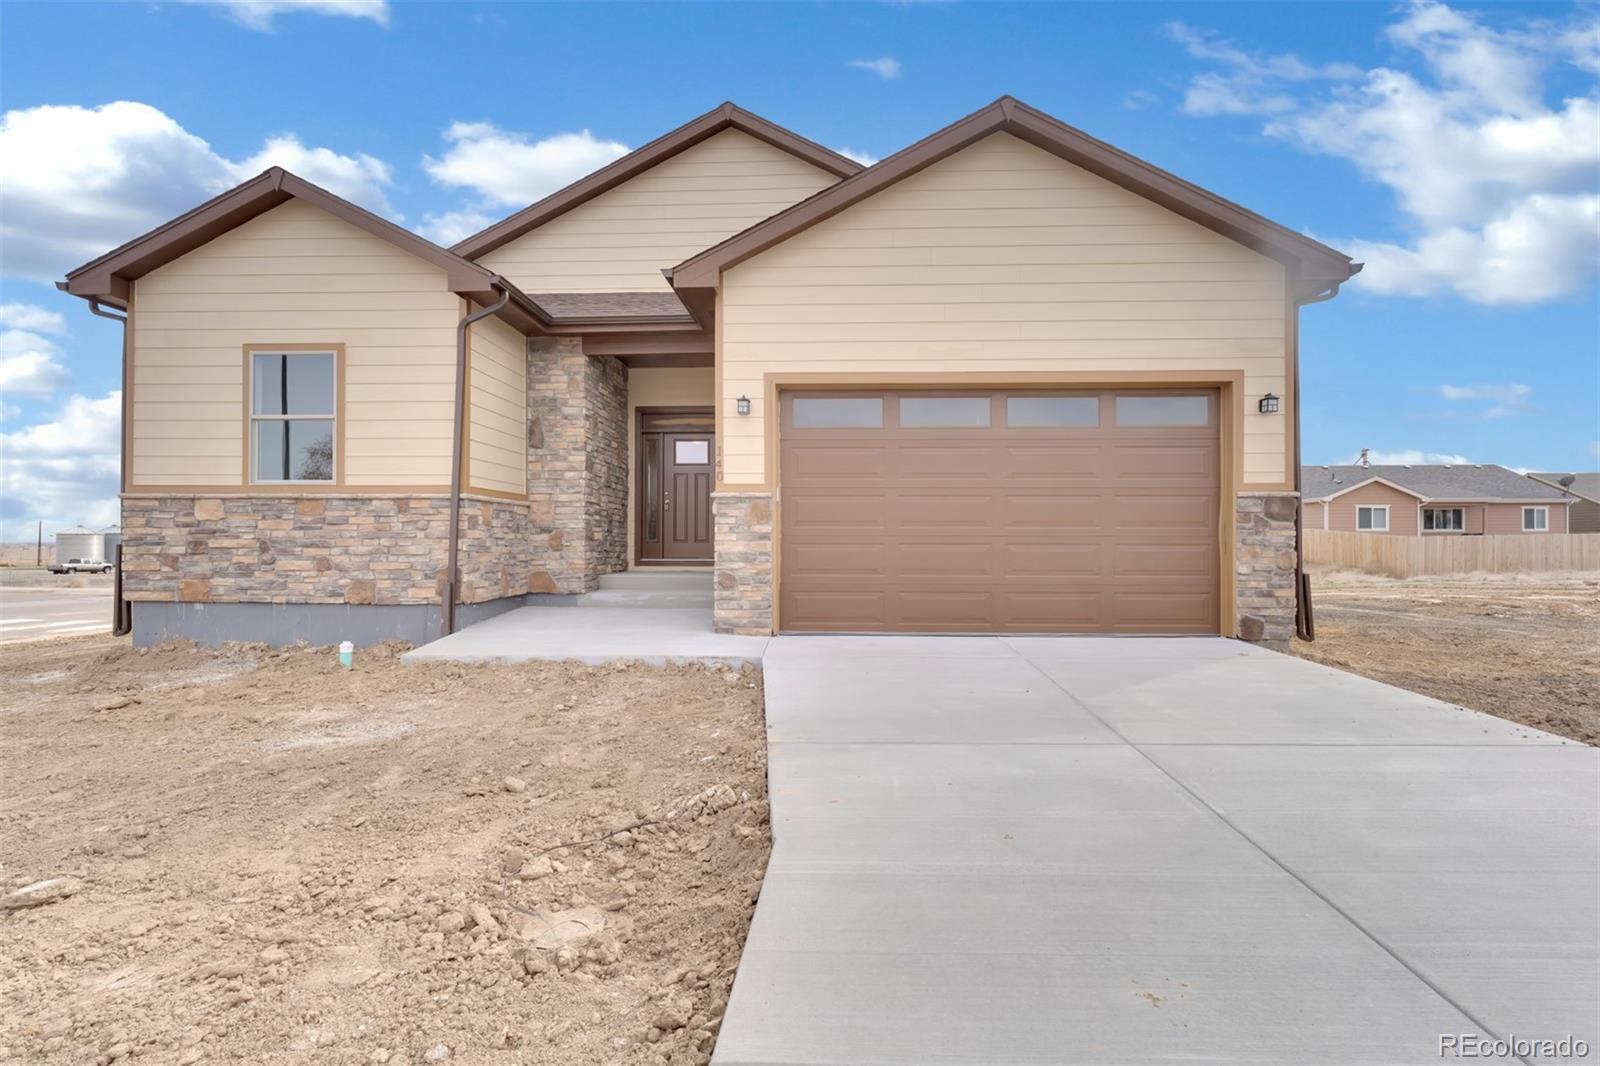 140 Johnson Circle, Keenesburg, CO 80643 - Keenesburg, CO real estate listing